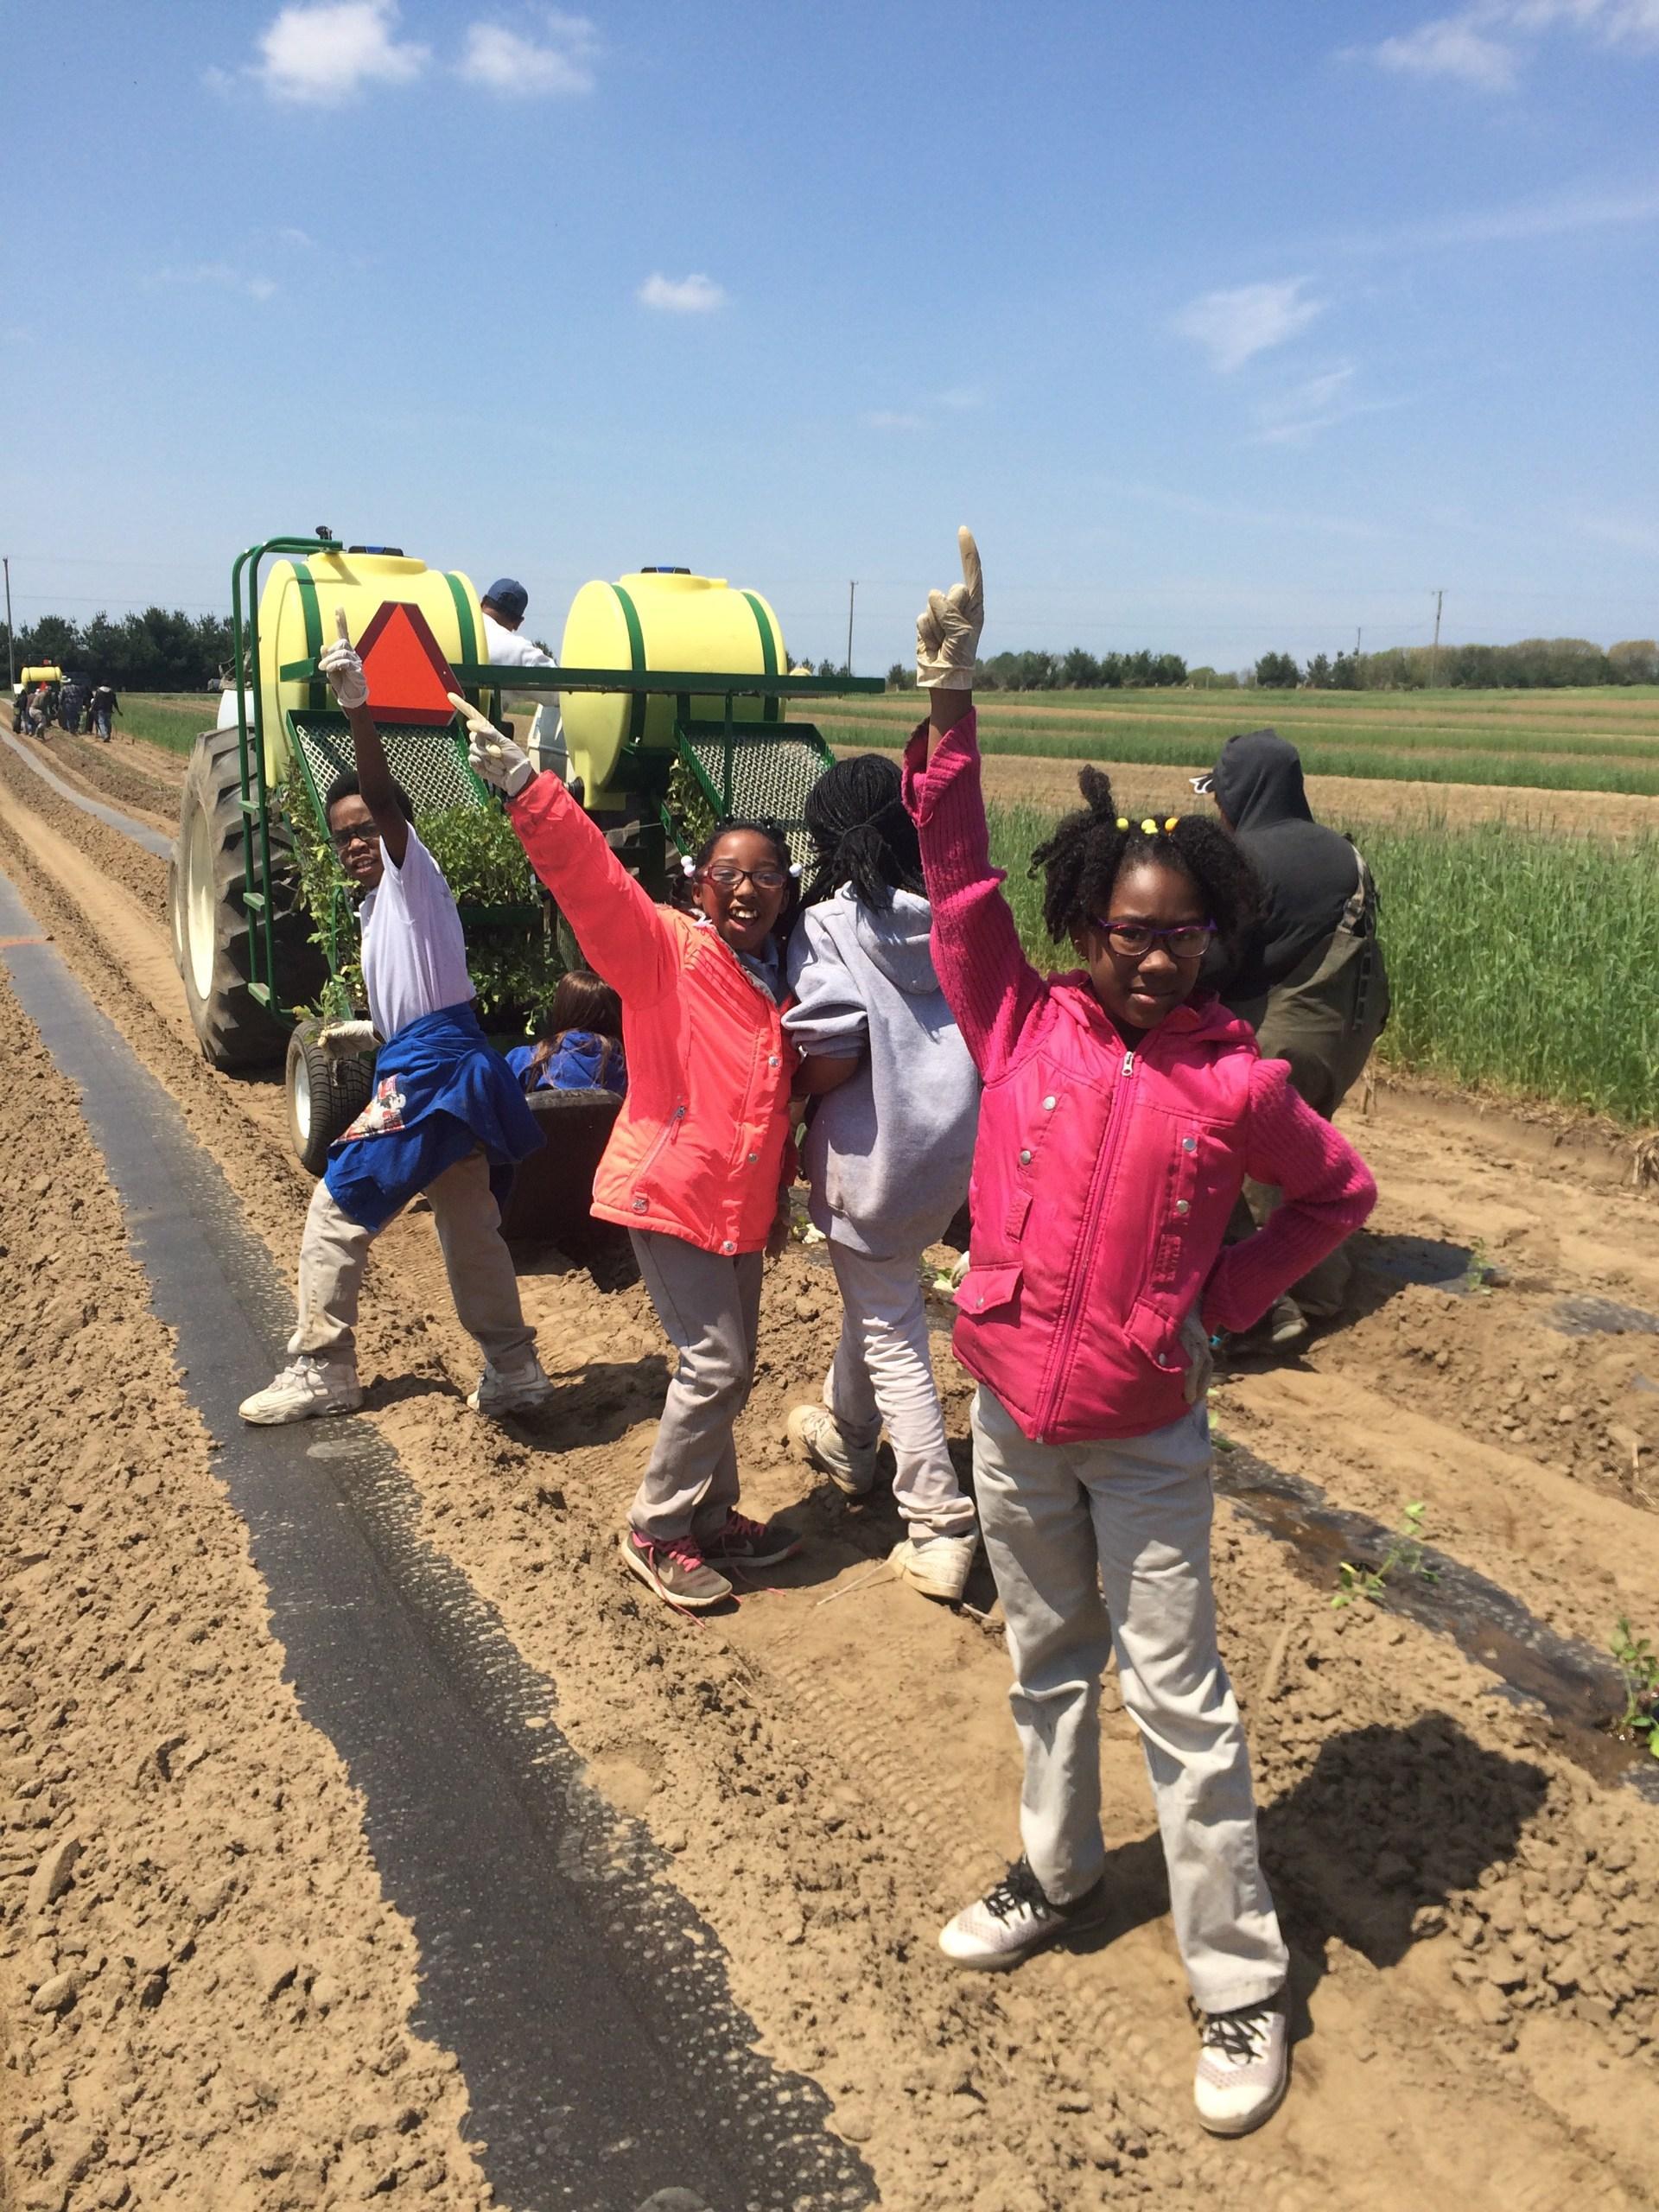 Students on the farm